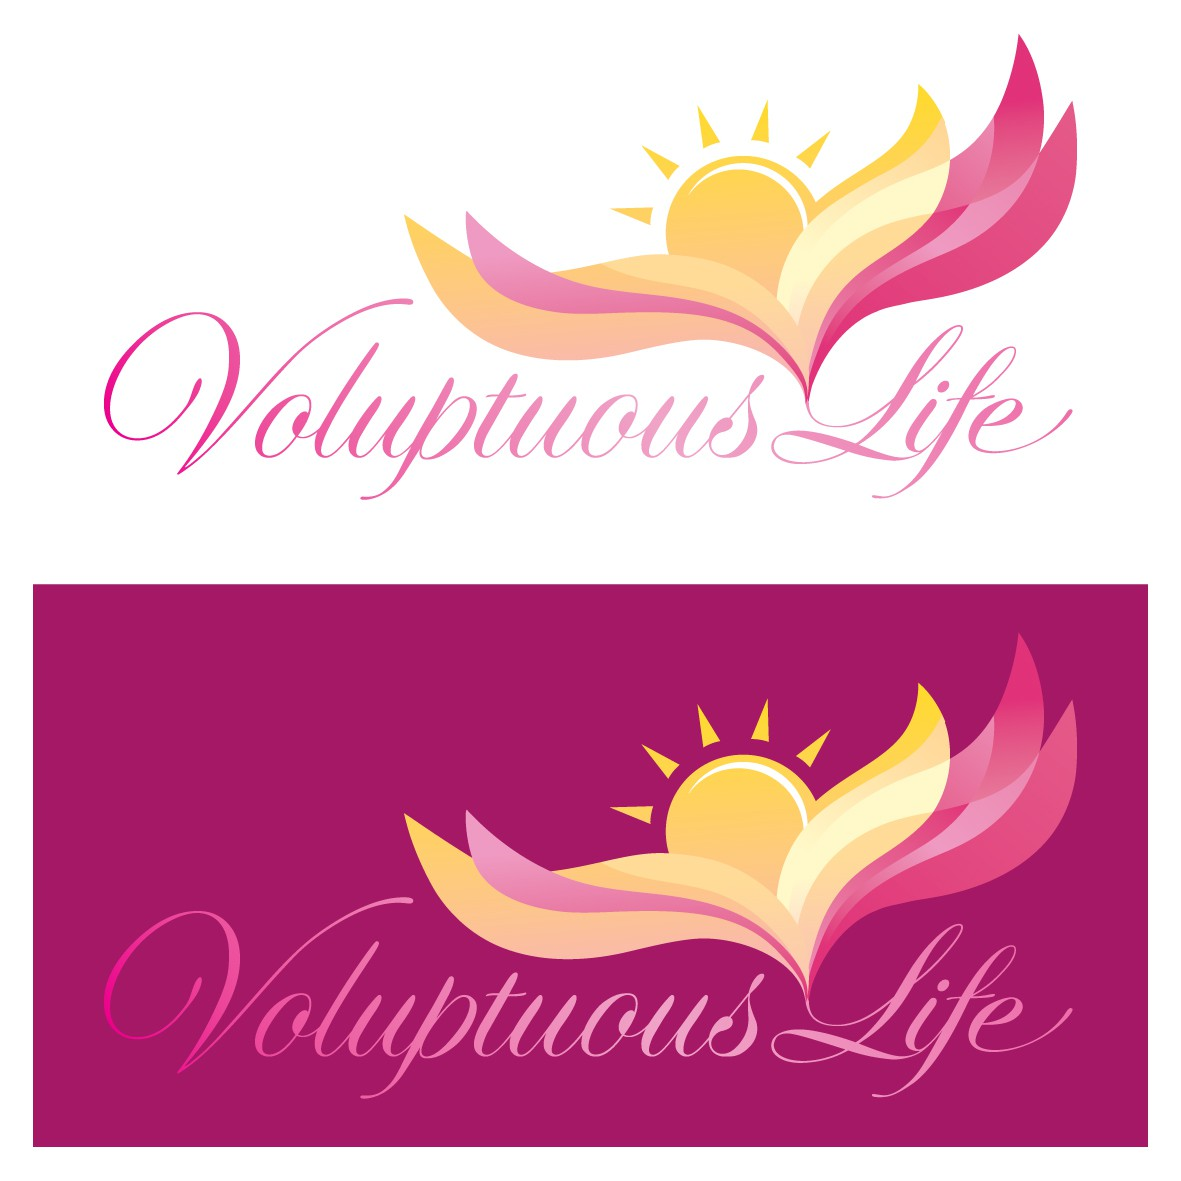 Voluptuous Life wants an inspiring logo